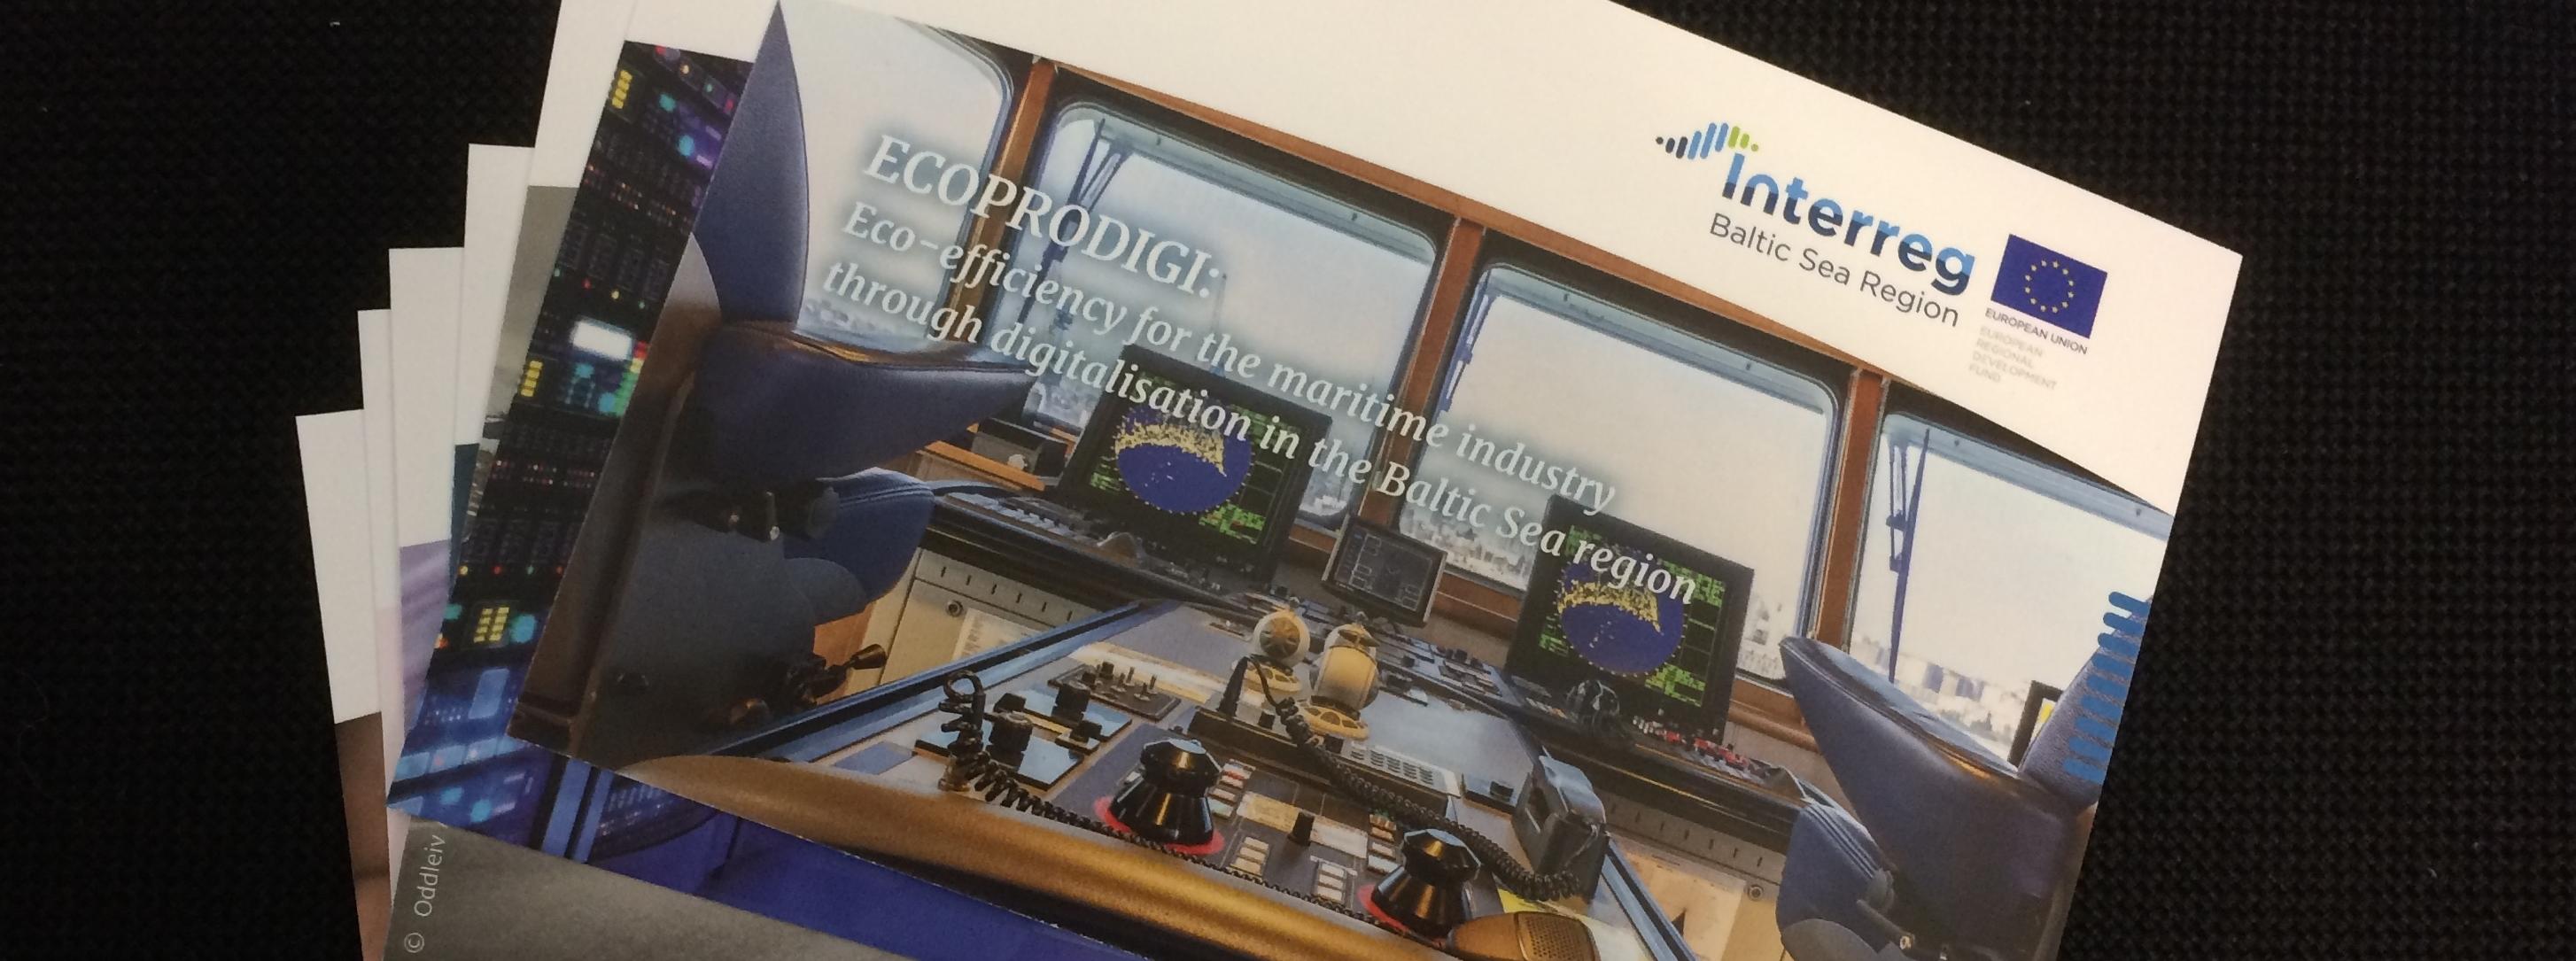 Bridging the Baltic Sea through Cooperation